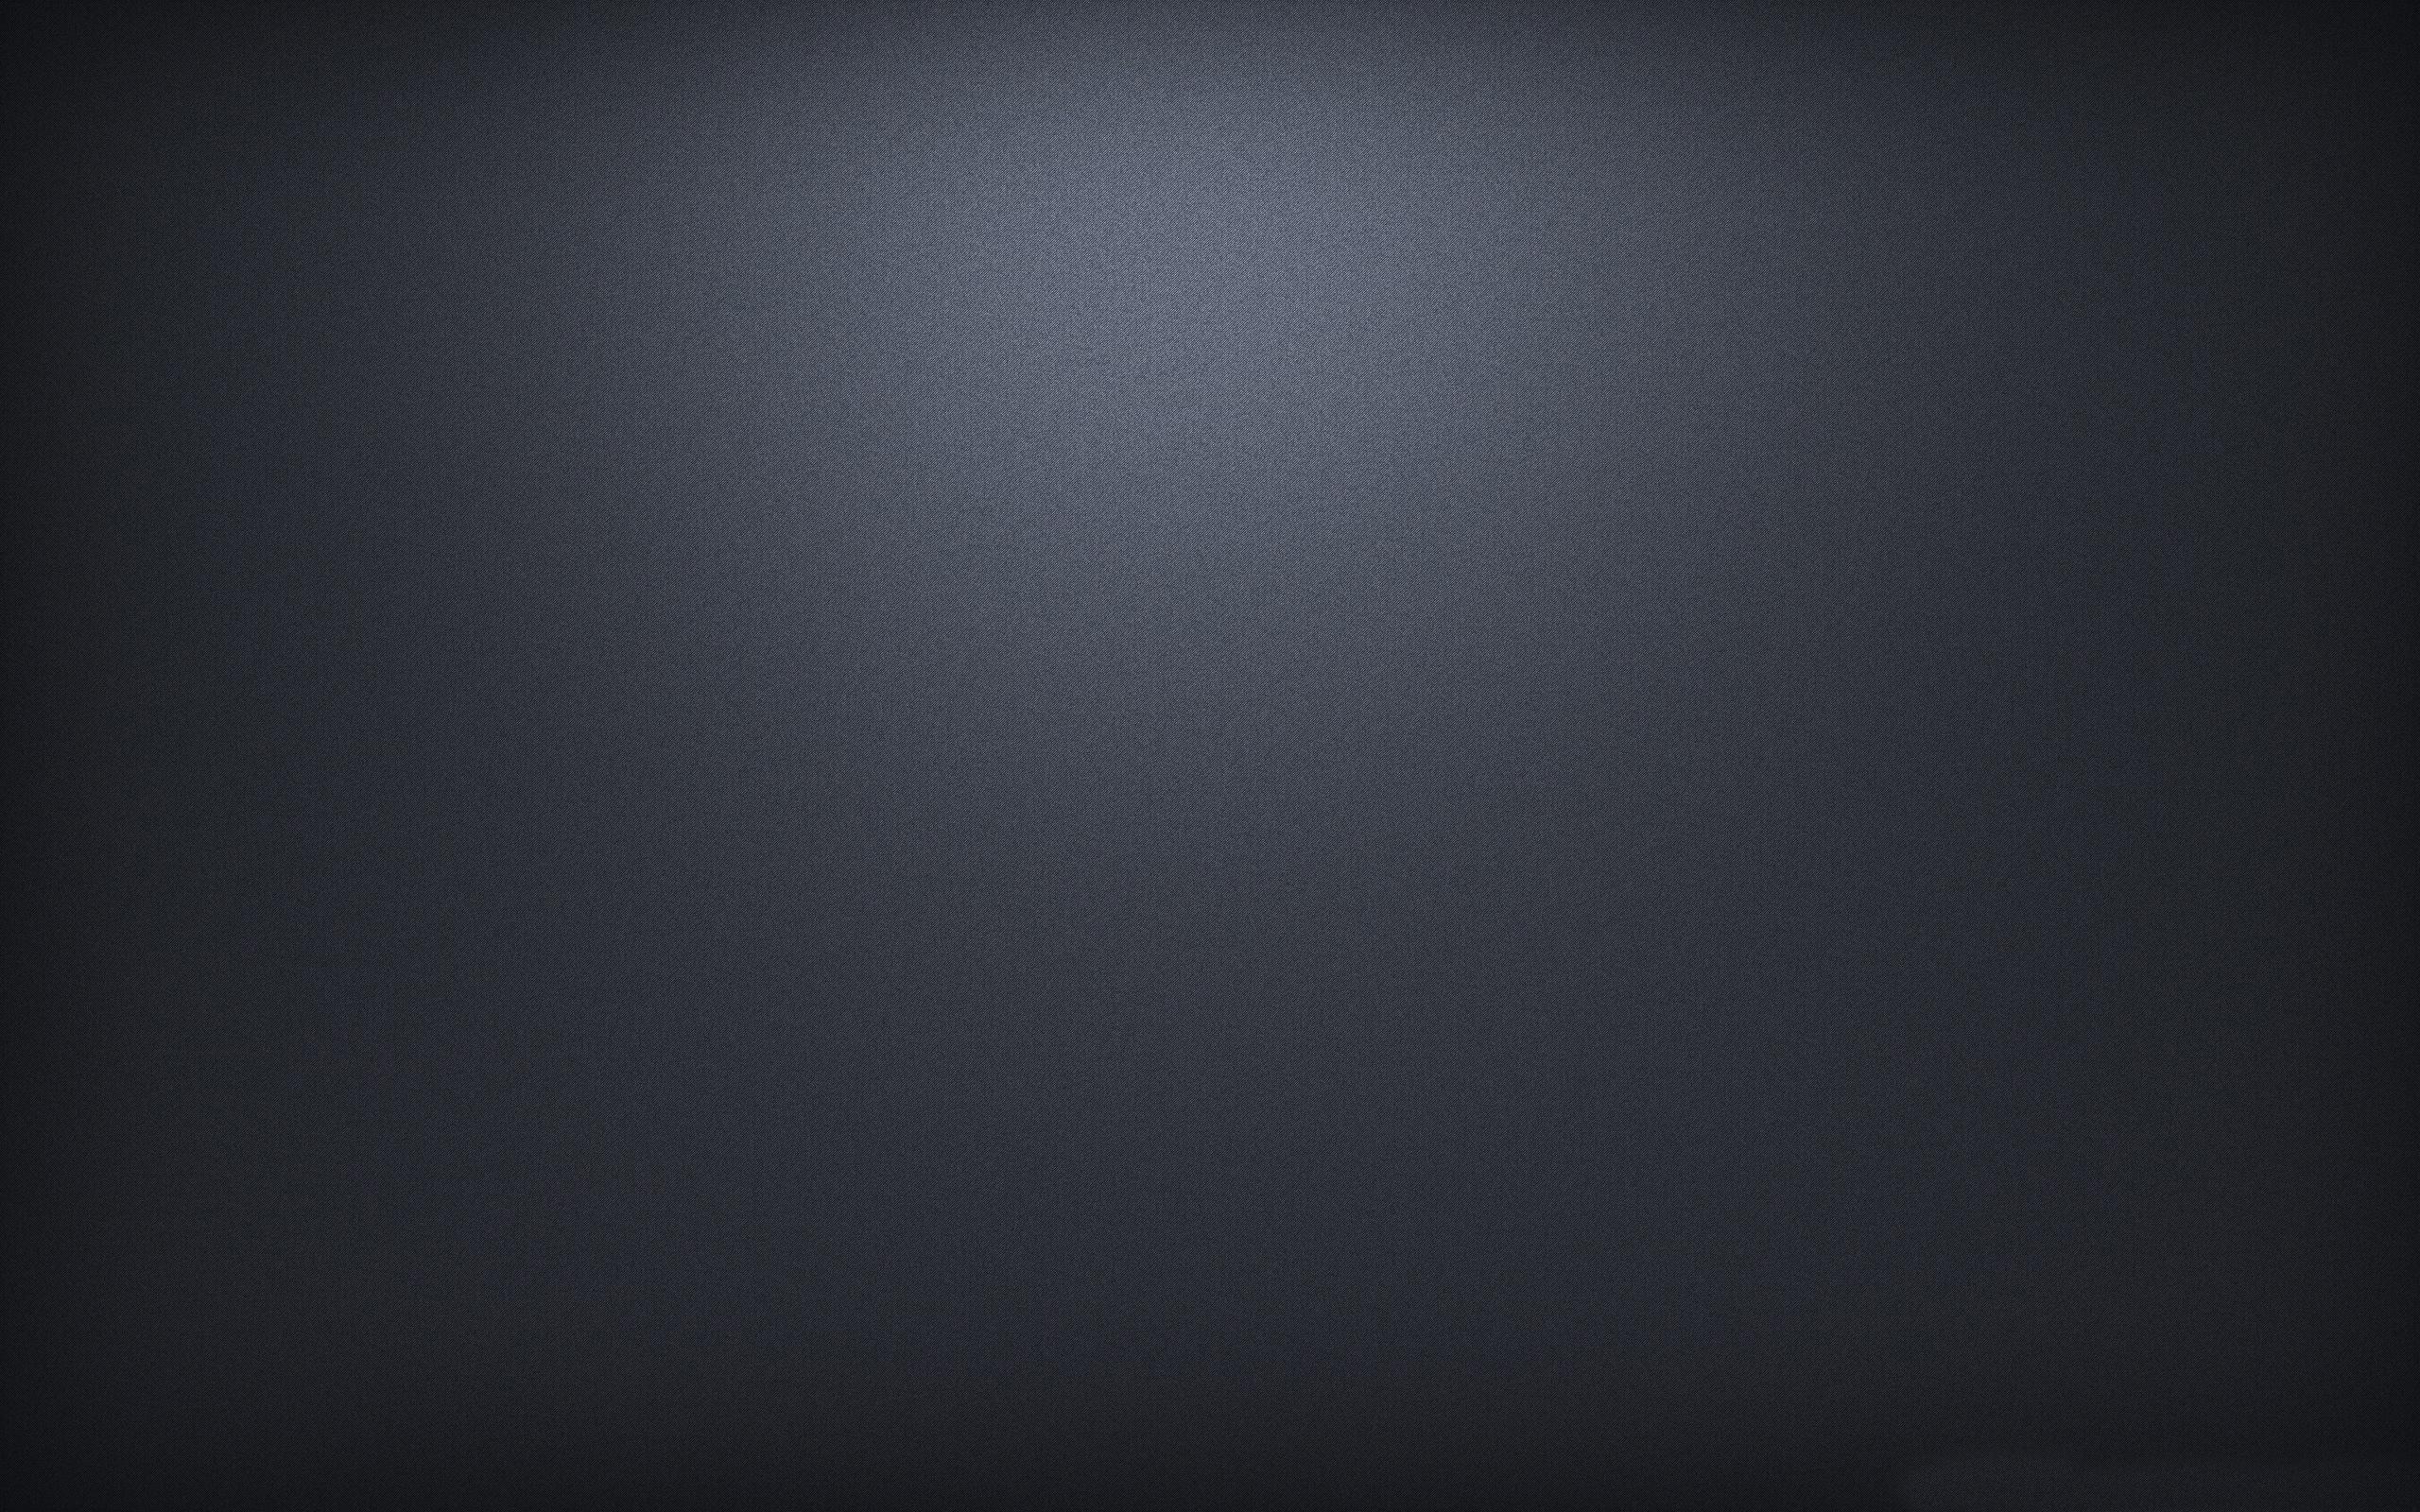 73 Mac Pro Backgrounds On Wallpapersafari